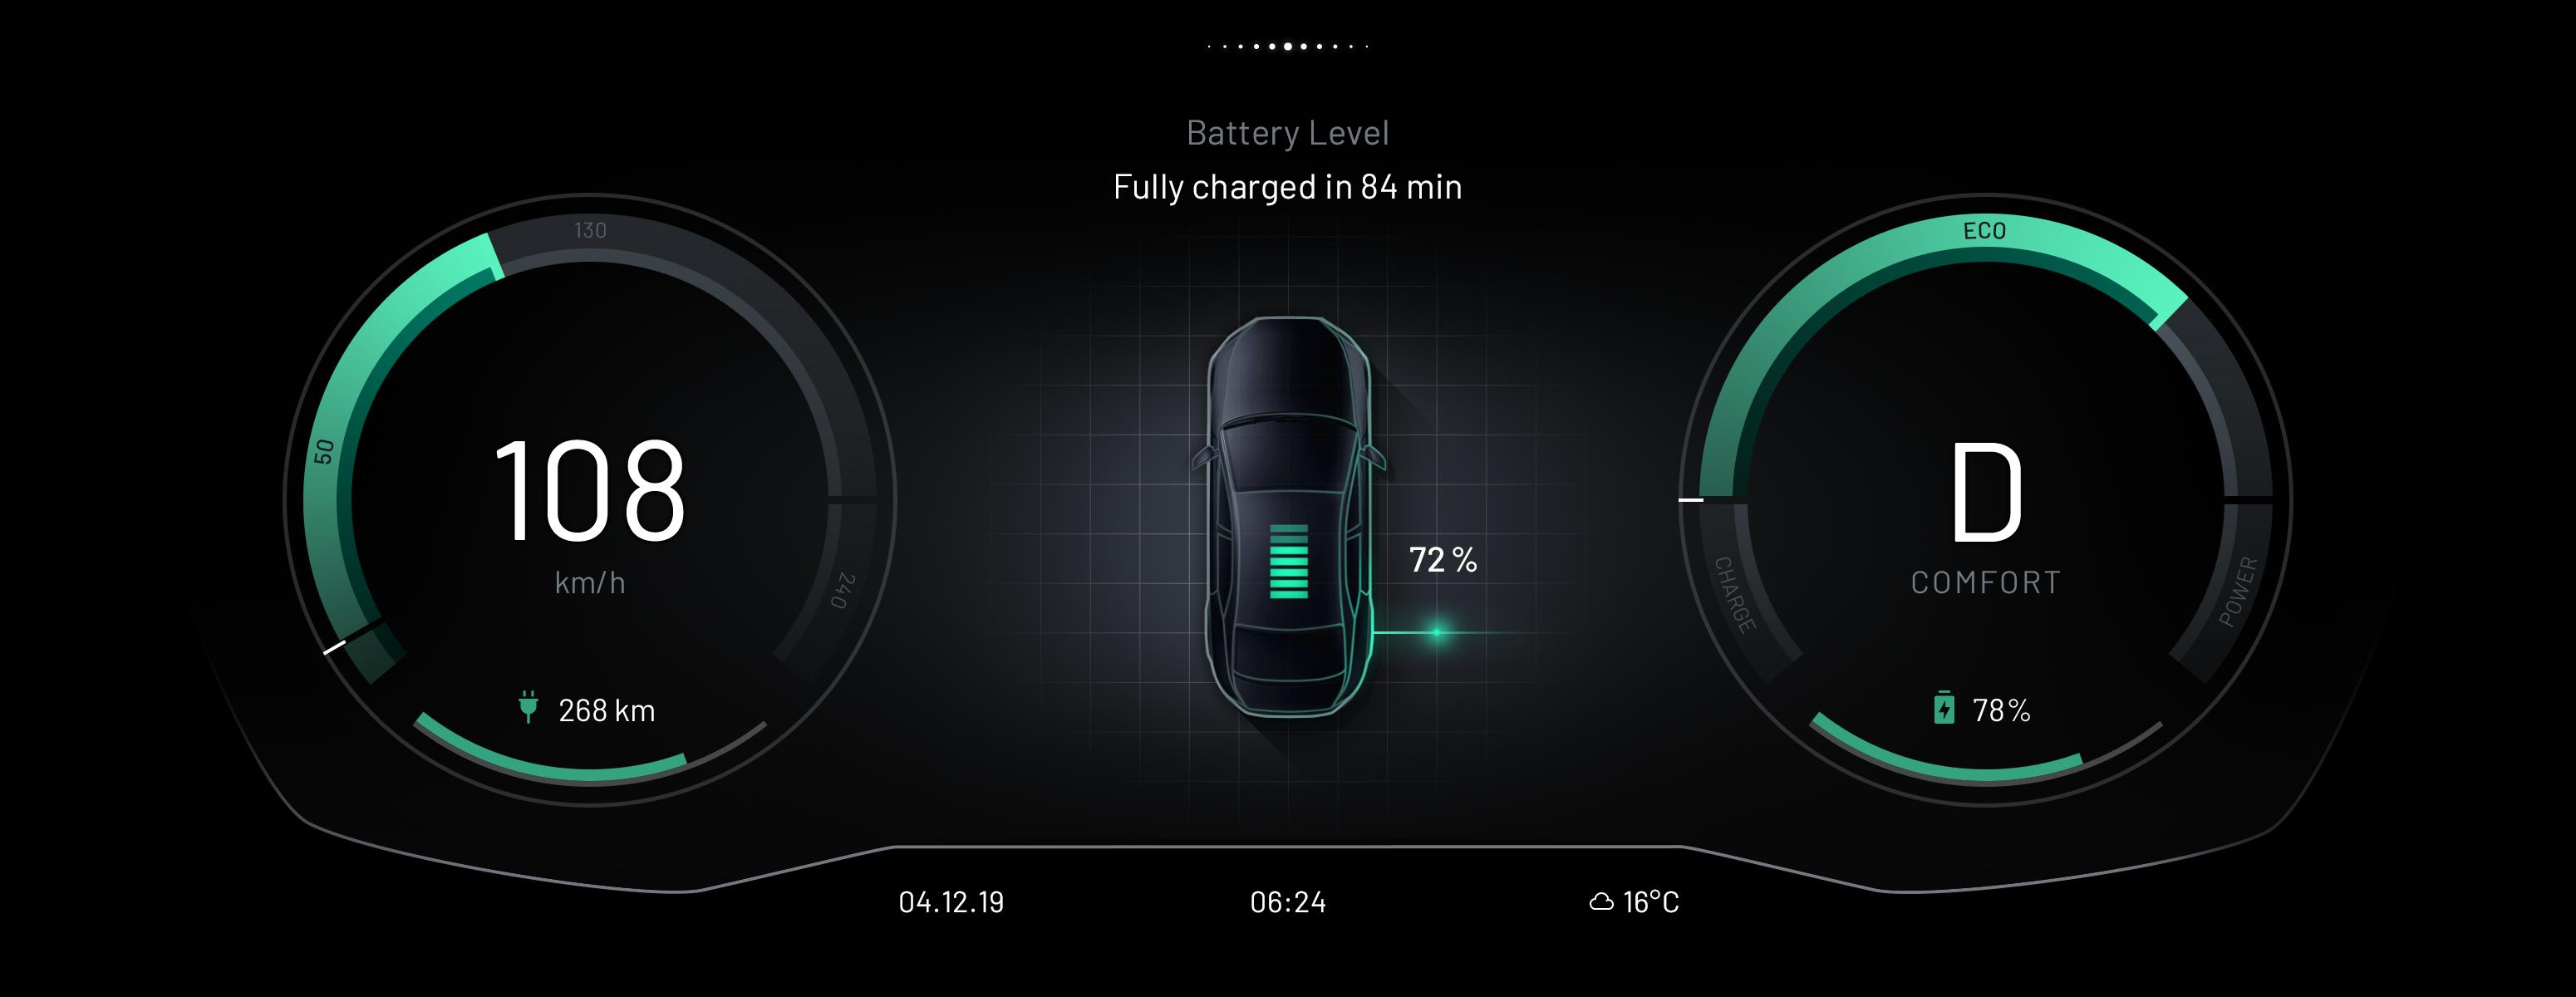 EB GUIDE Car HMI battery